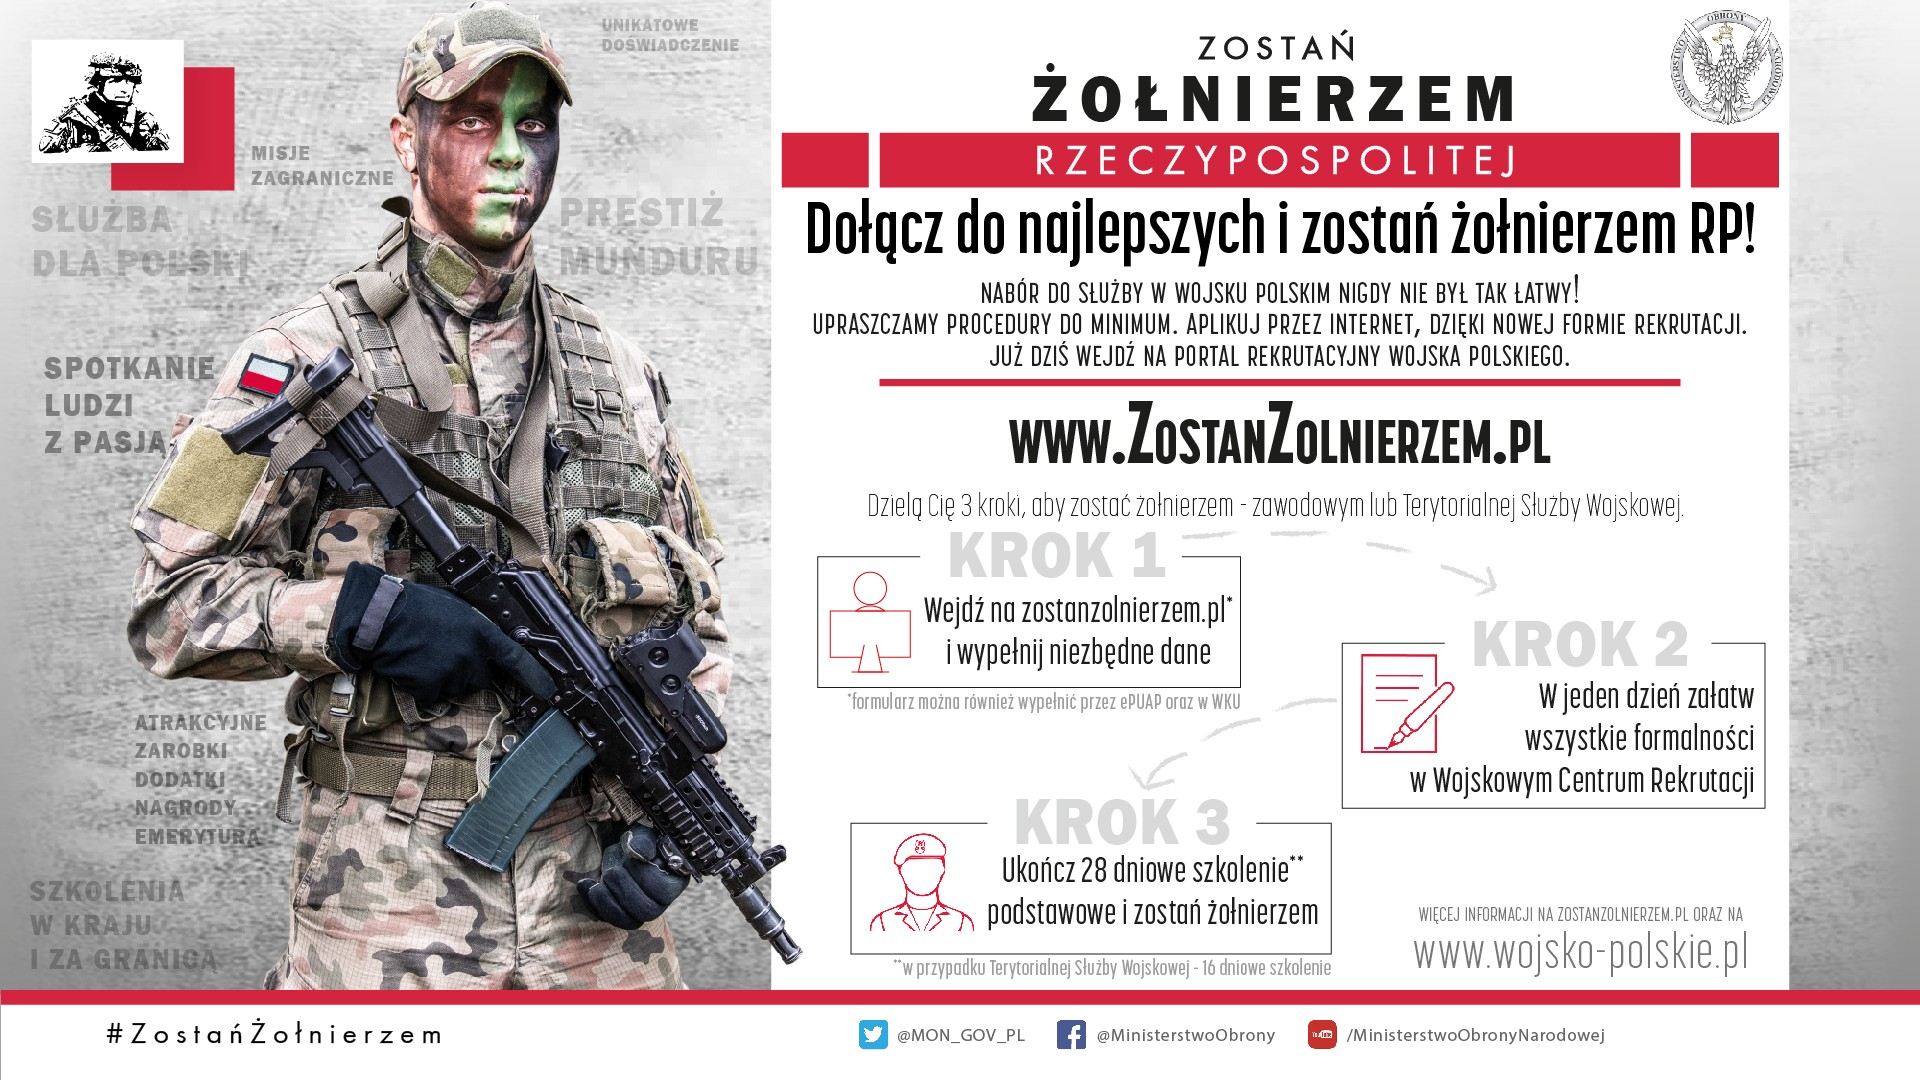 zz-post-fb-tt-zz-1080x1920-stopka-jasny-5f60946e506f9.jpg